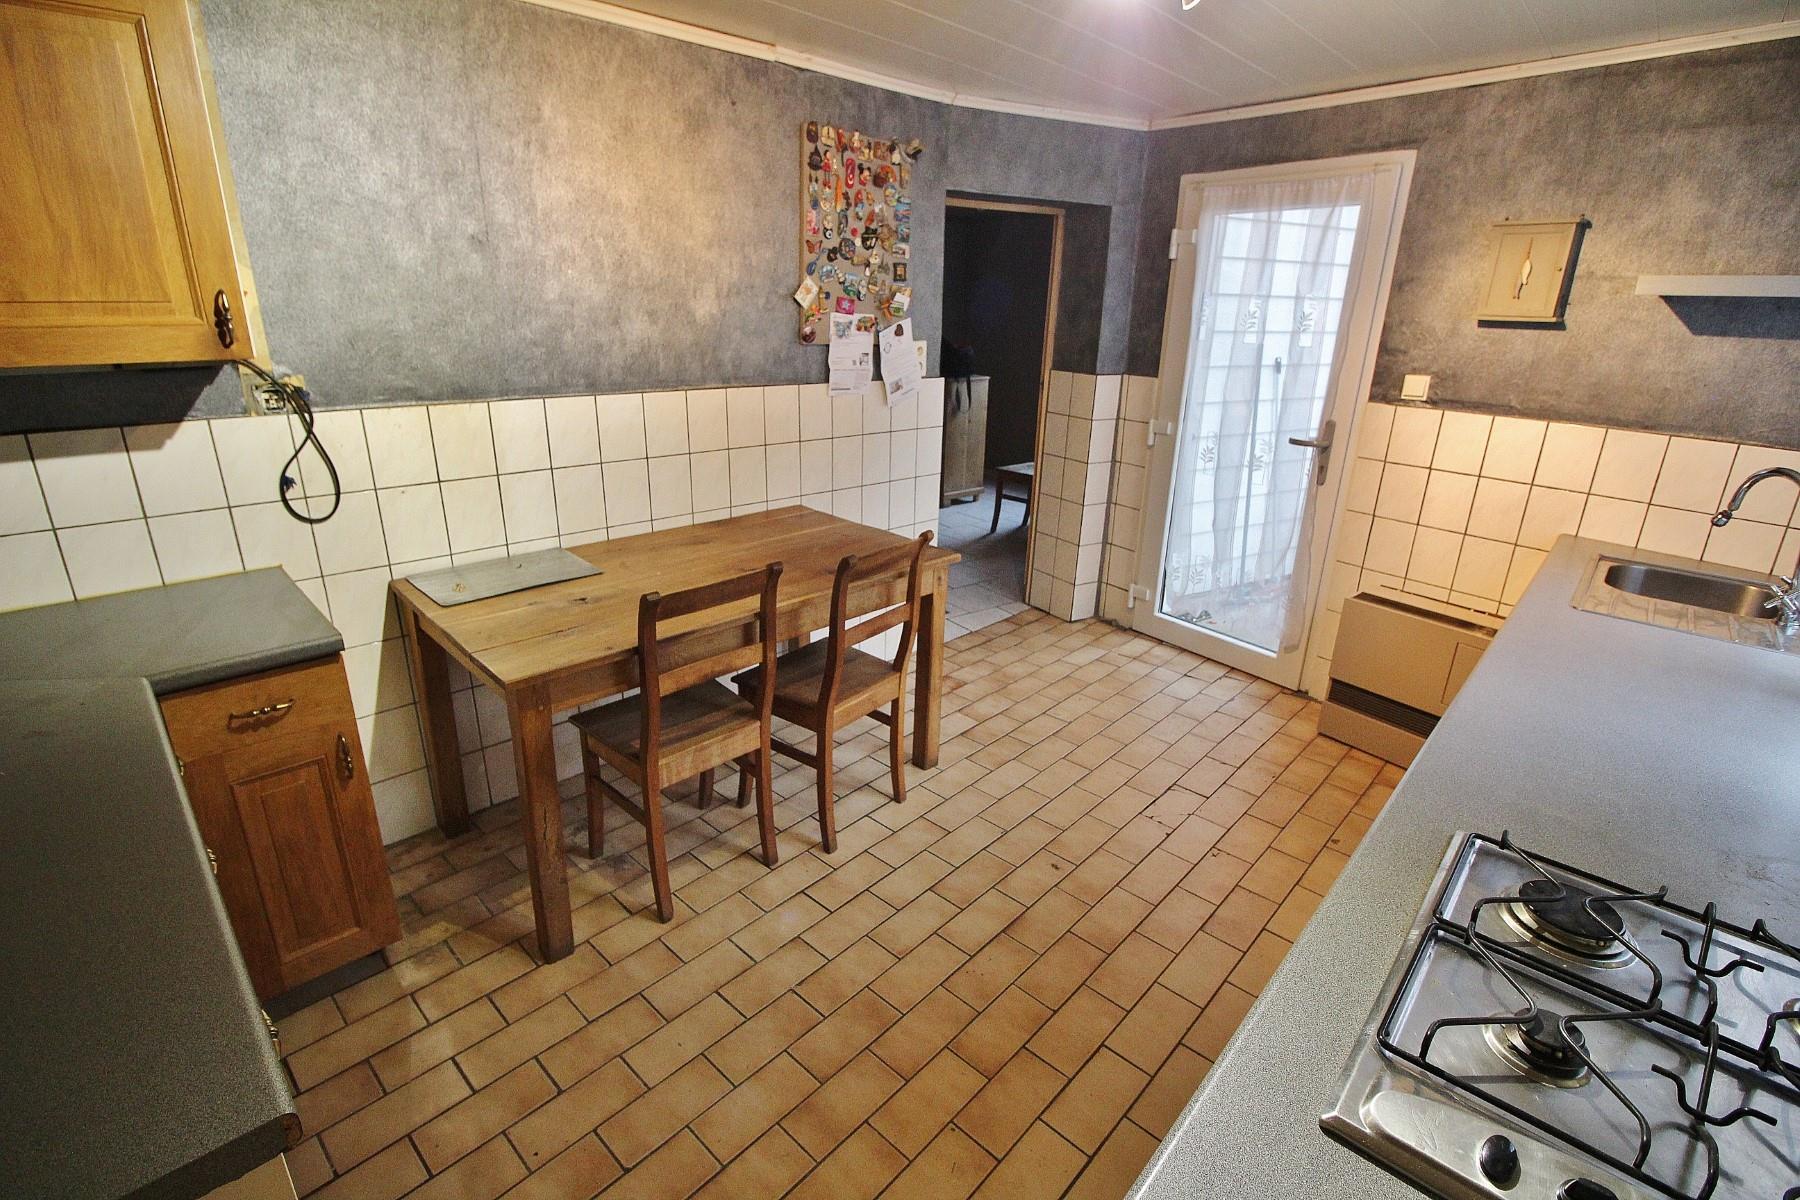 Maison - Beyne-Heusay Bellaire - #3946189-5